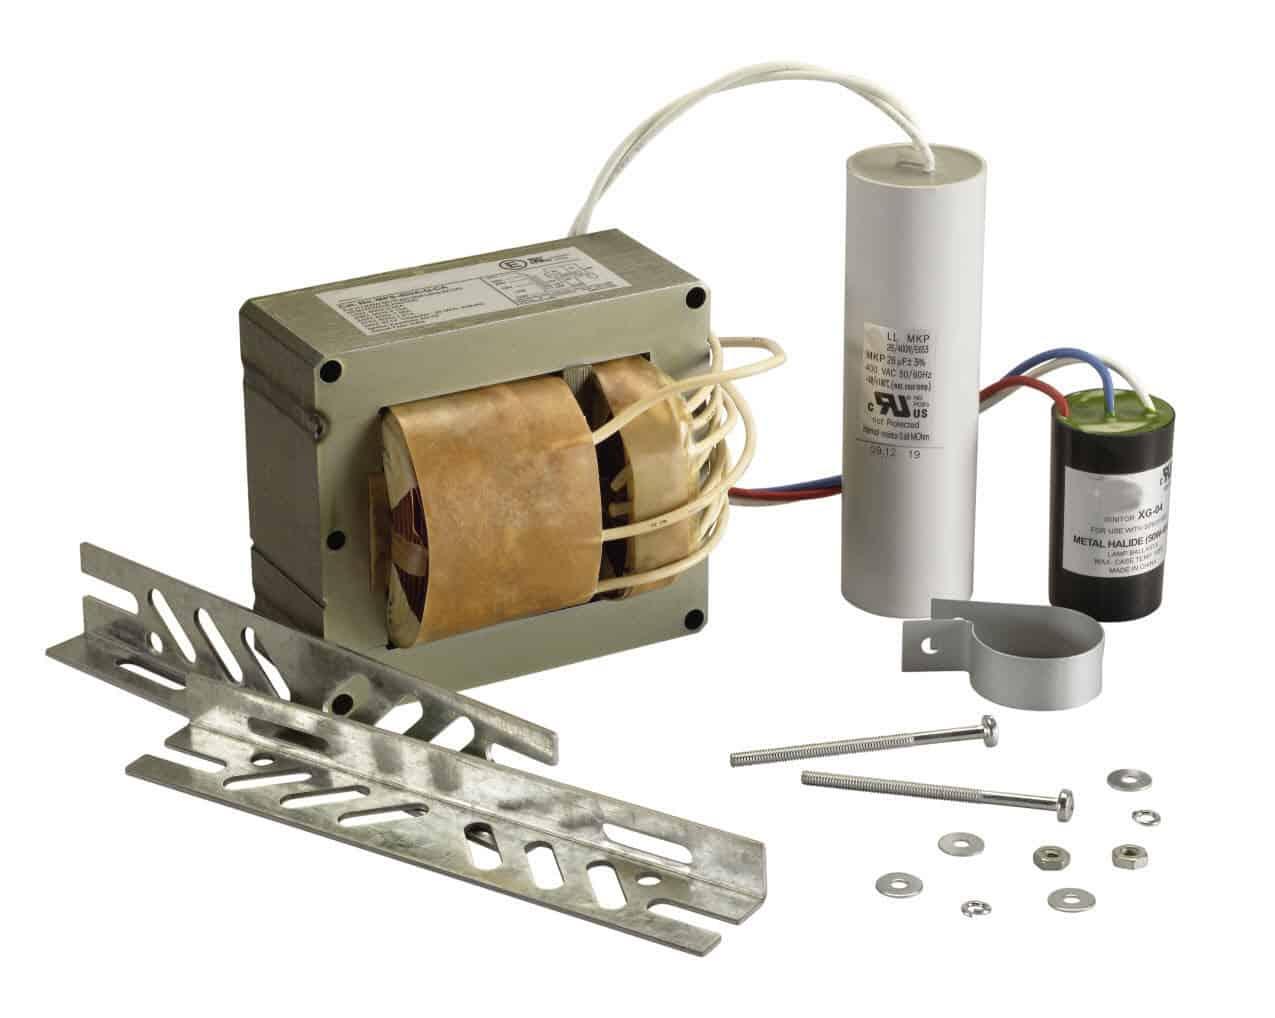 hight resolution of how to install a hid ballast mix 150 watt mercury vapor ballast wiring